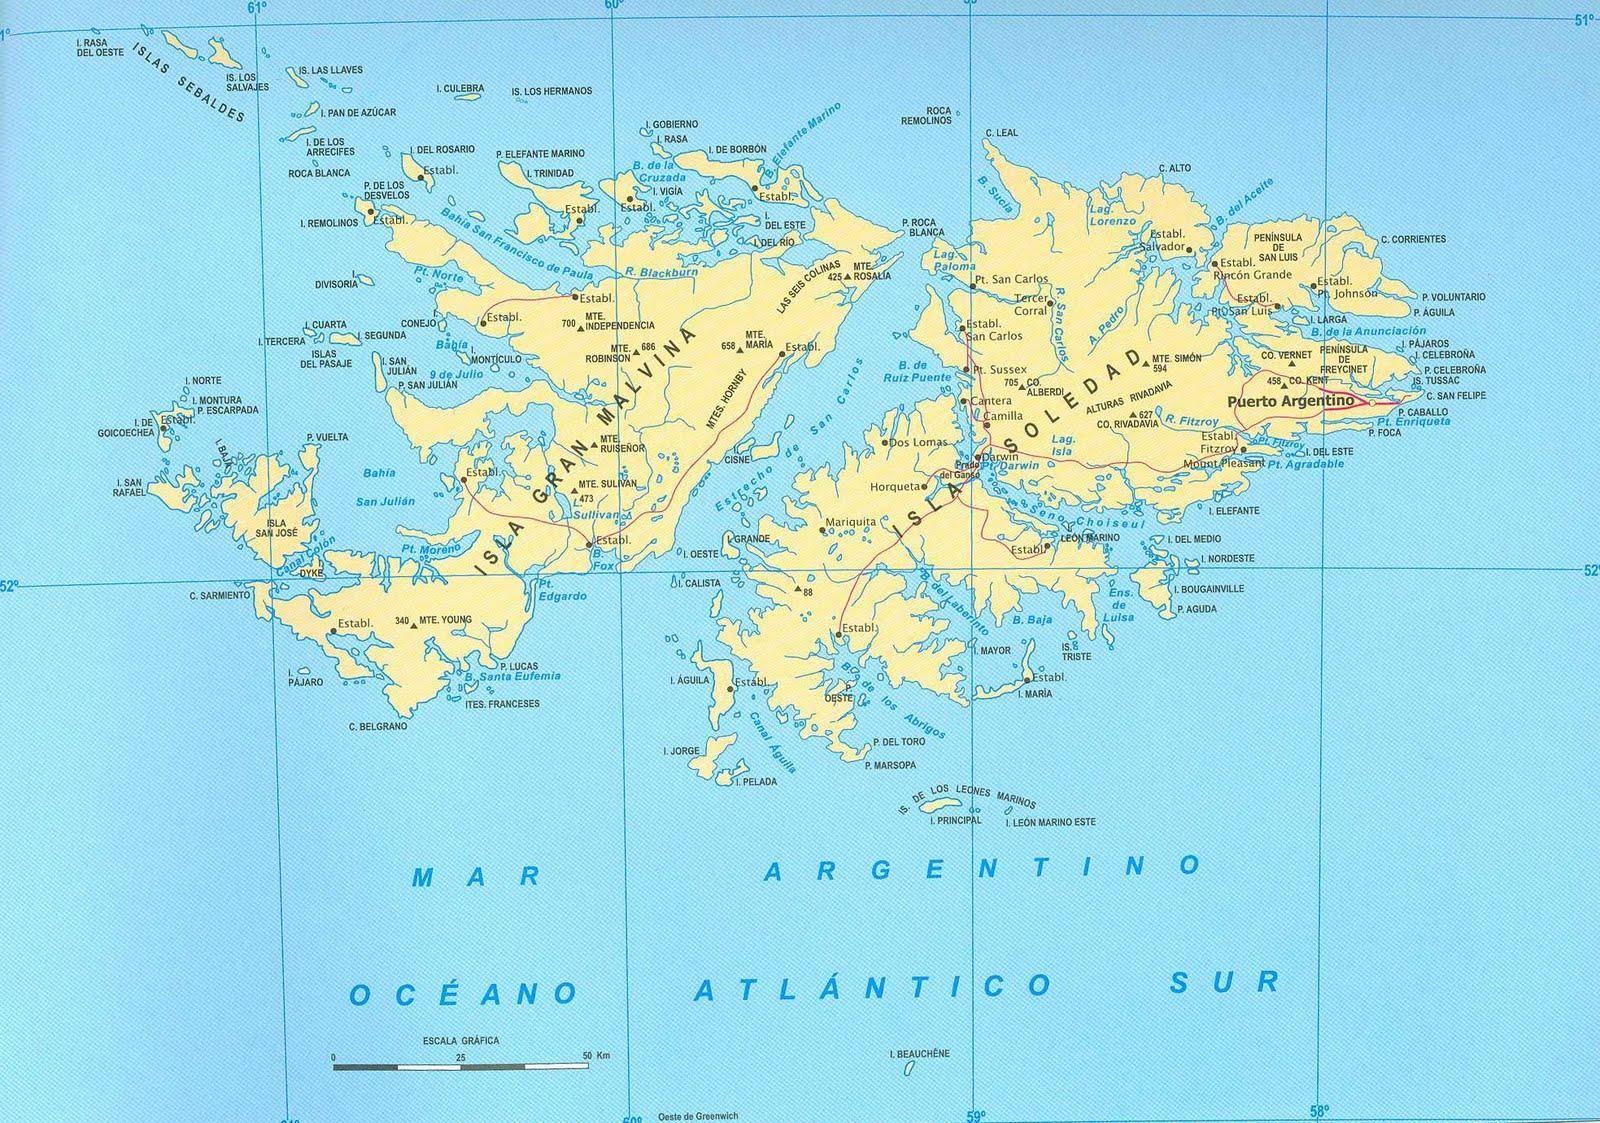 GEOGRAFIA E HISTORIA GEOGRAFIA La Islas Malvinas